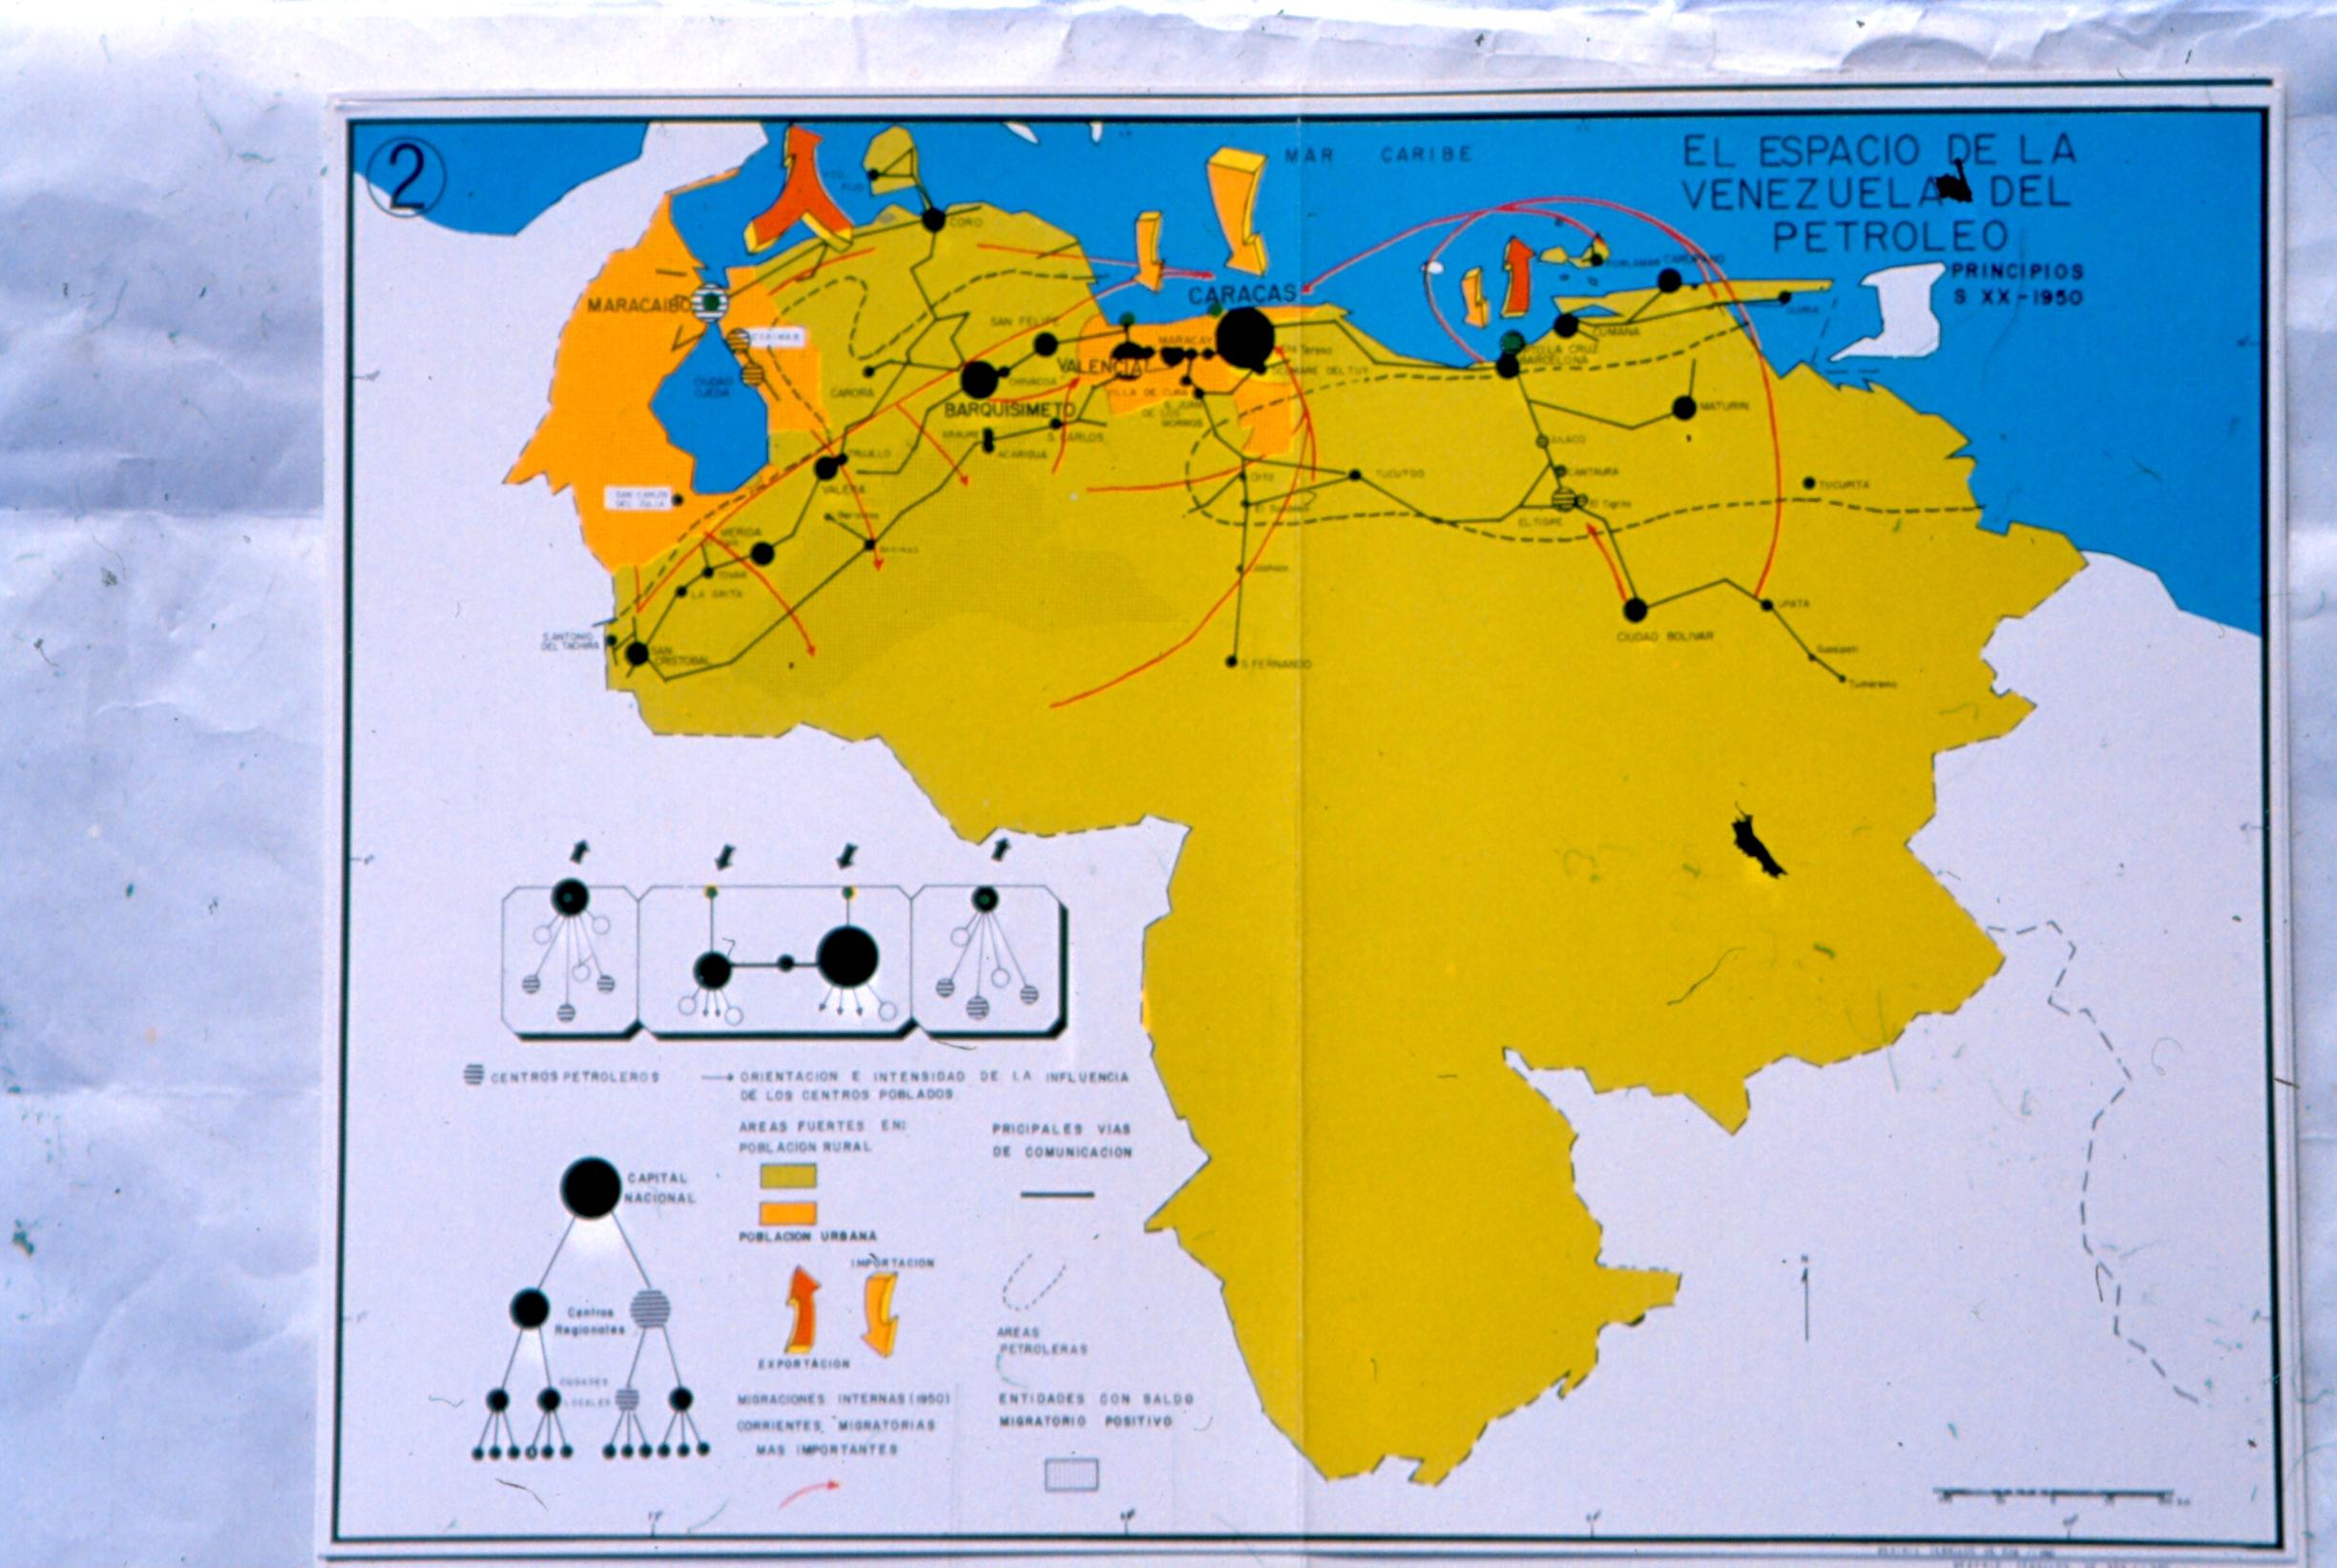 F-05006-Mapas-Venezuela-Caracas-B-Ceballos